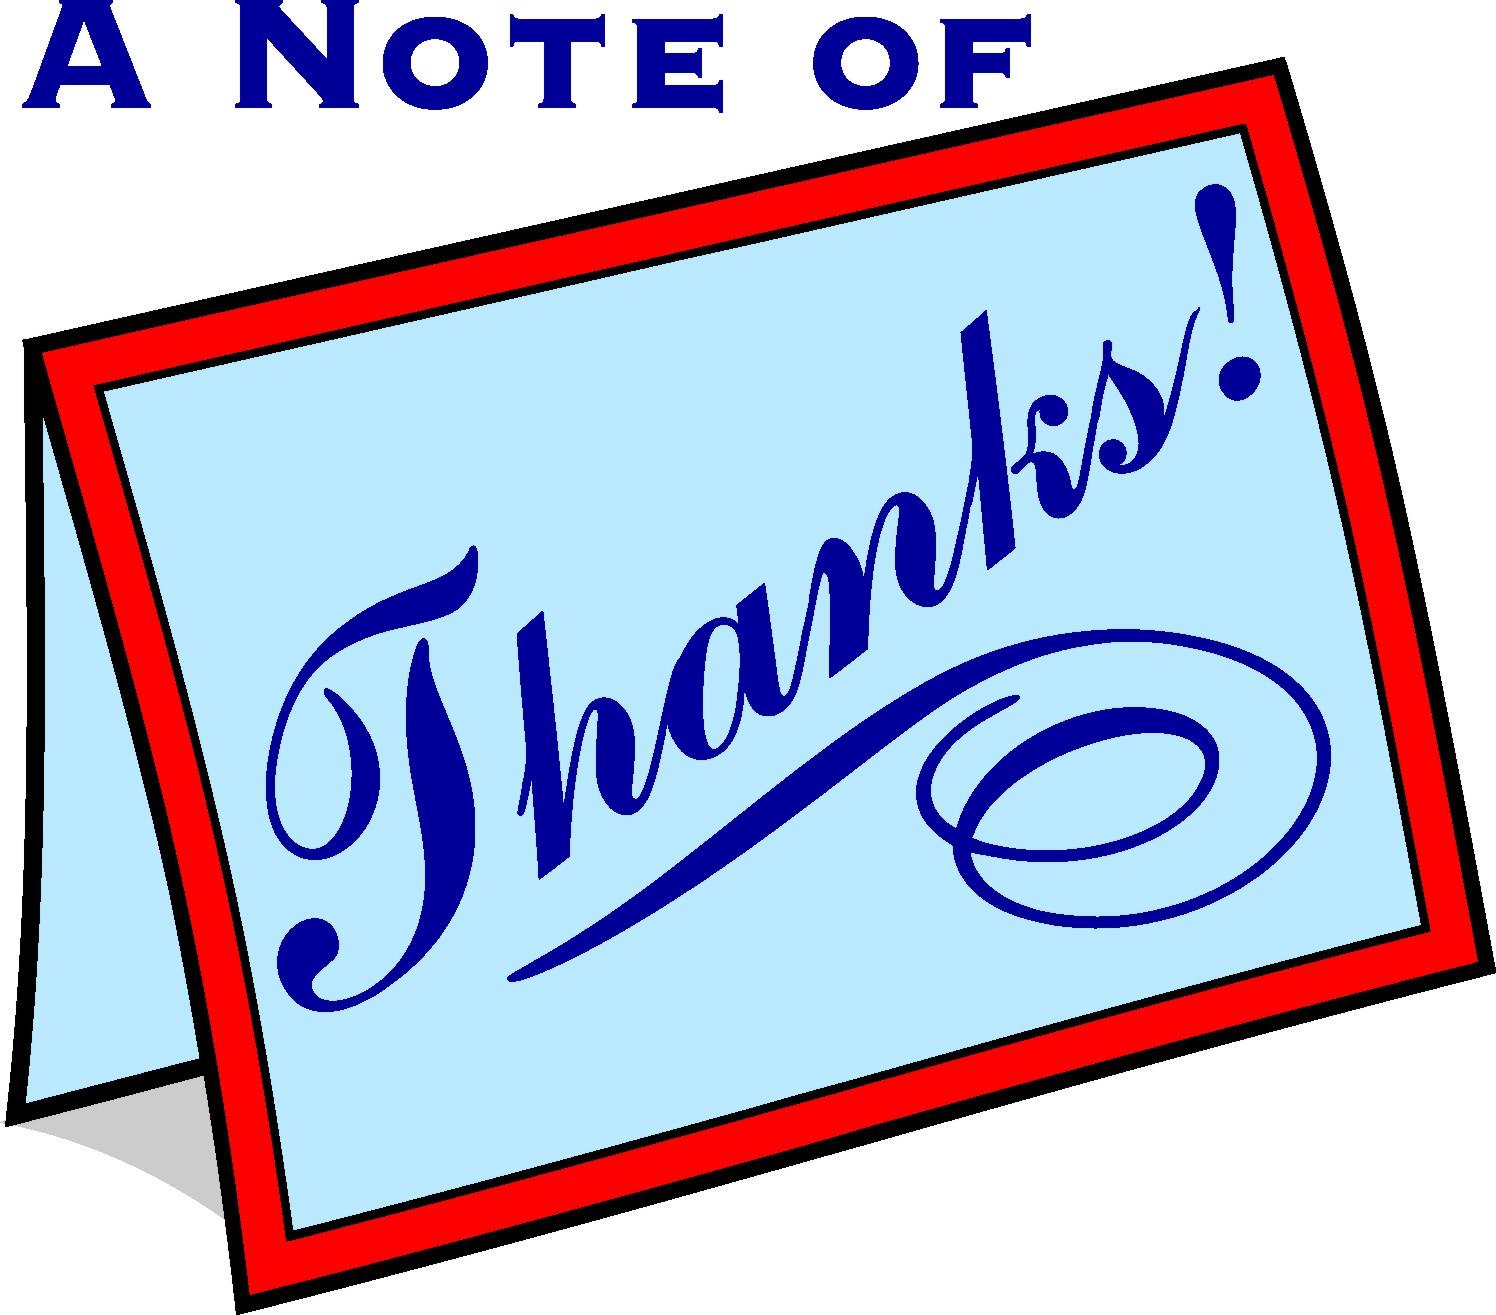 Thanks clipart thank you card. Clip art panda free